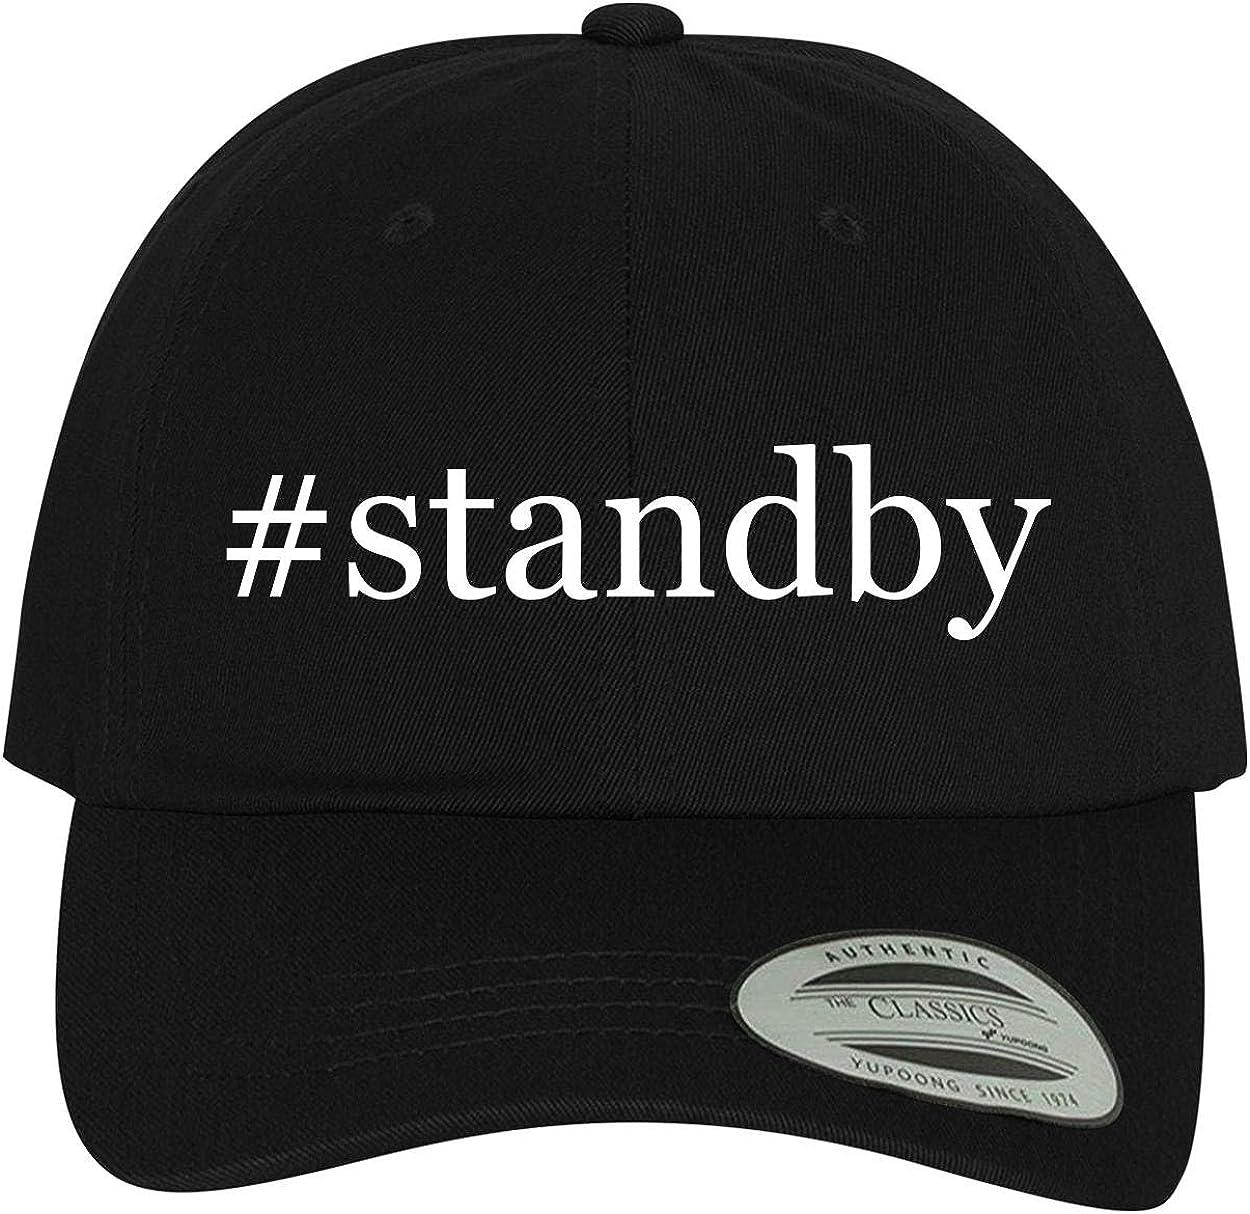 Comfortable Dad Hat Baseball Cap BH Cool Designs #Standby